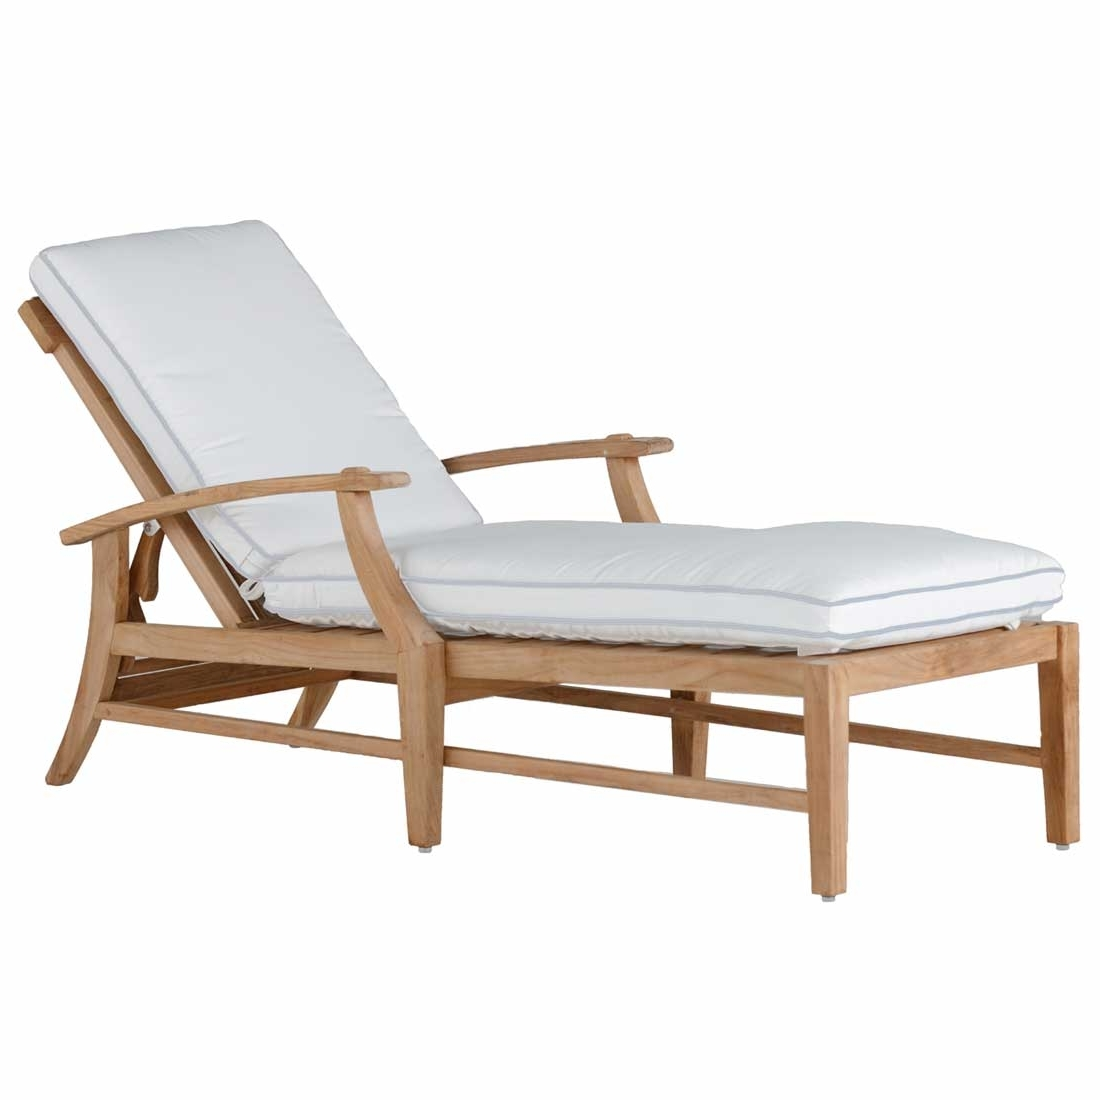 Croquet Teak Chaise – Summer Classics Regarding Newest Teak Chaise Lounges (View 4 of 15)